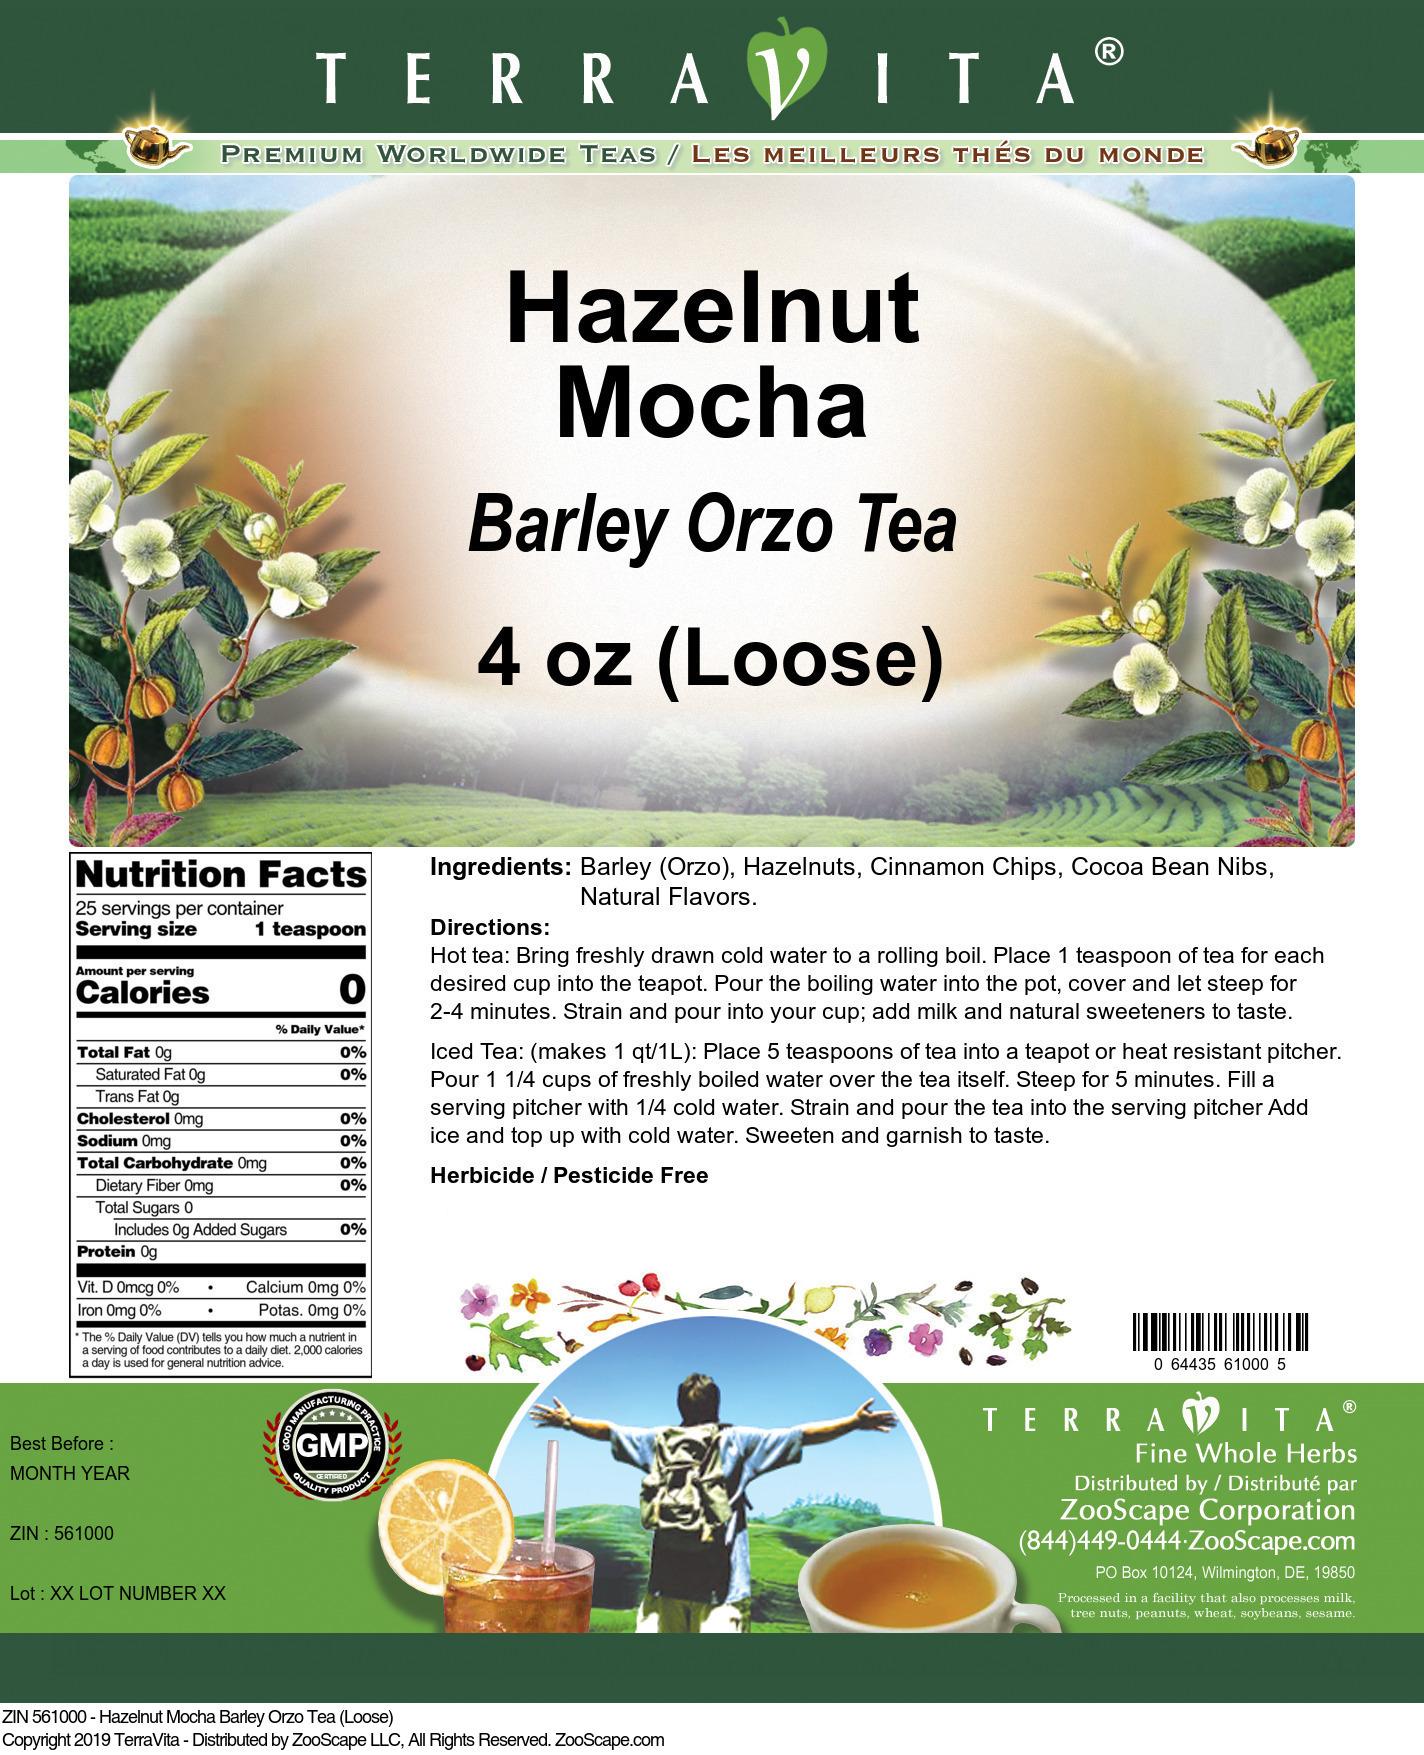 Hazelnut Mocha Barley Orzo Tea (Loose)